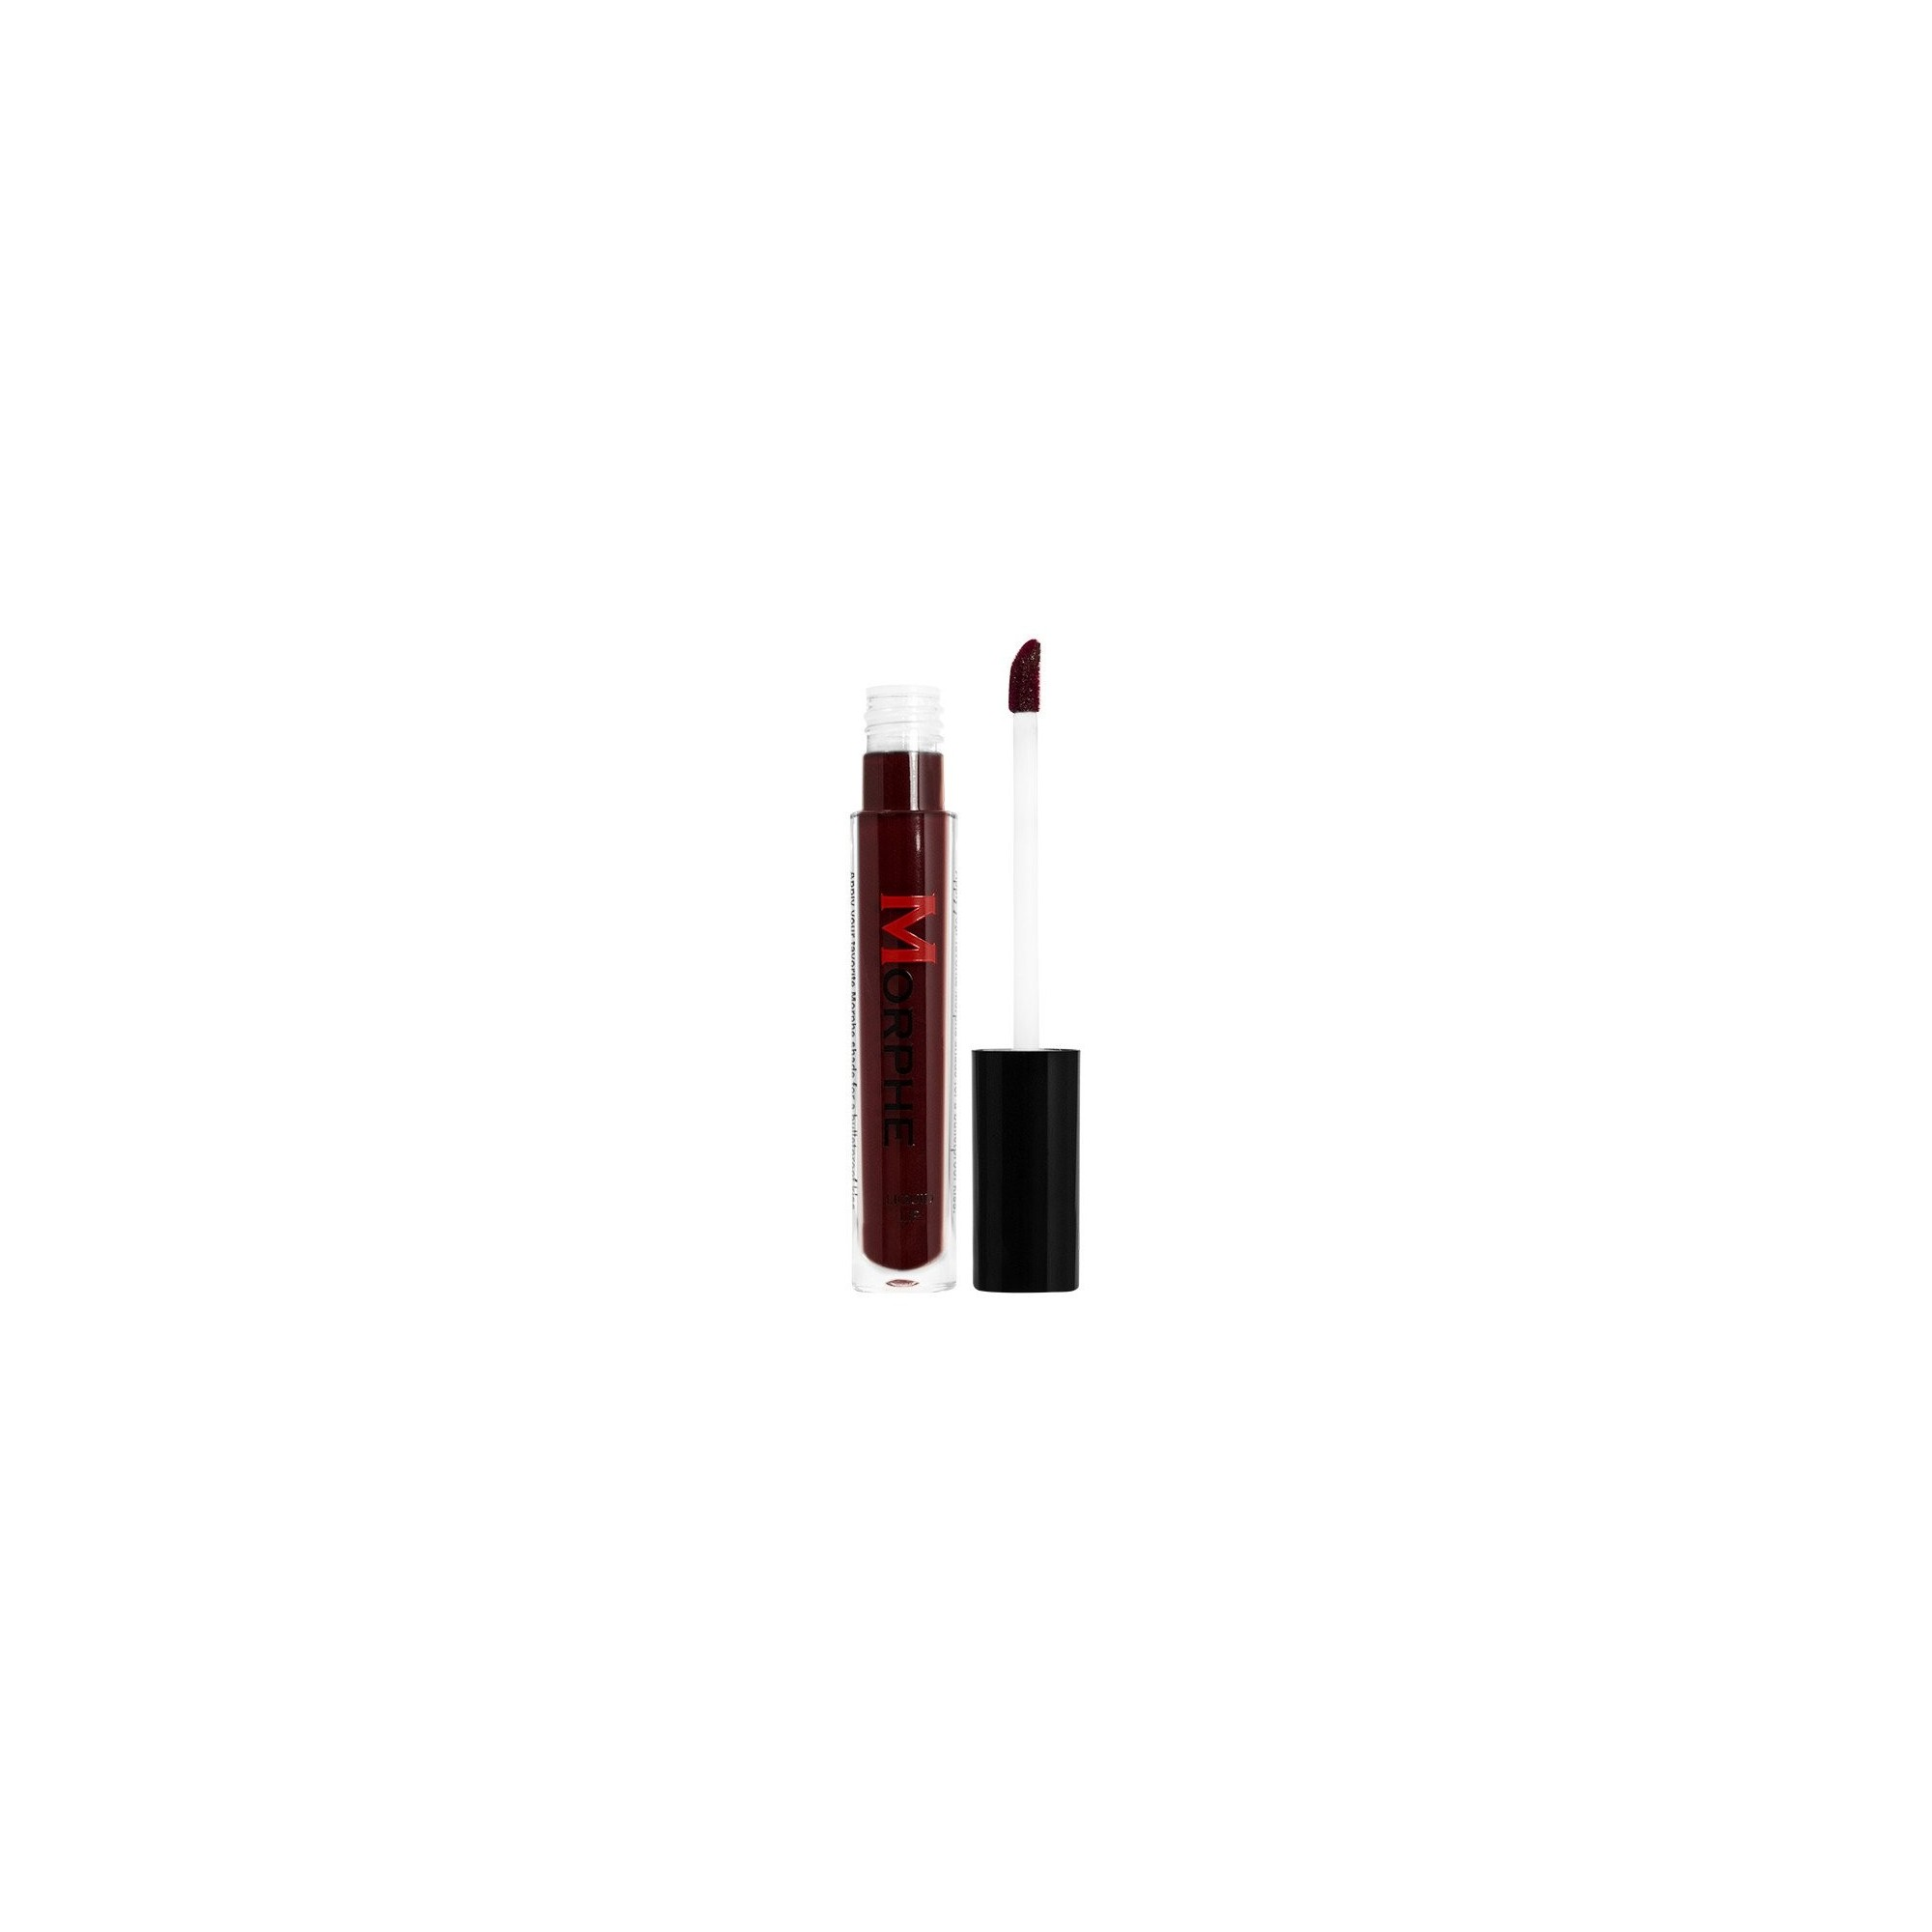 Morphe Liquid Lipstick Bloodshot